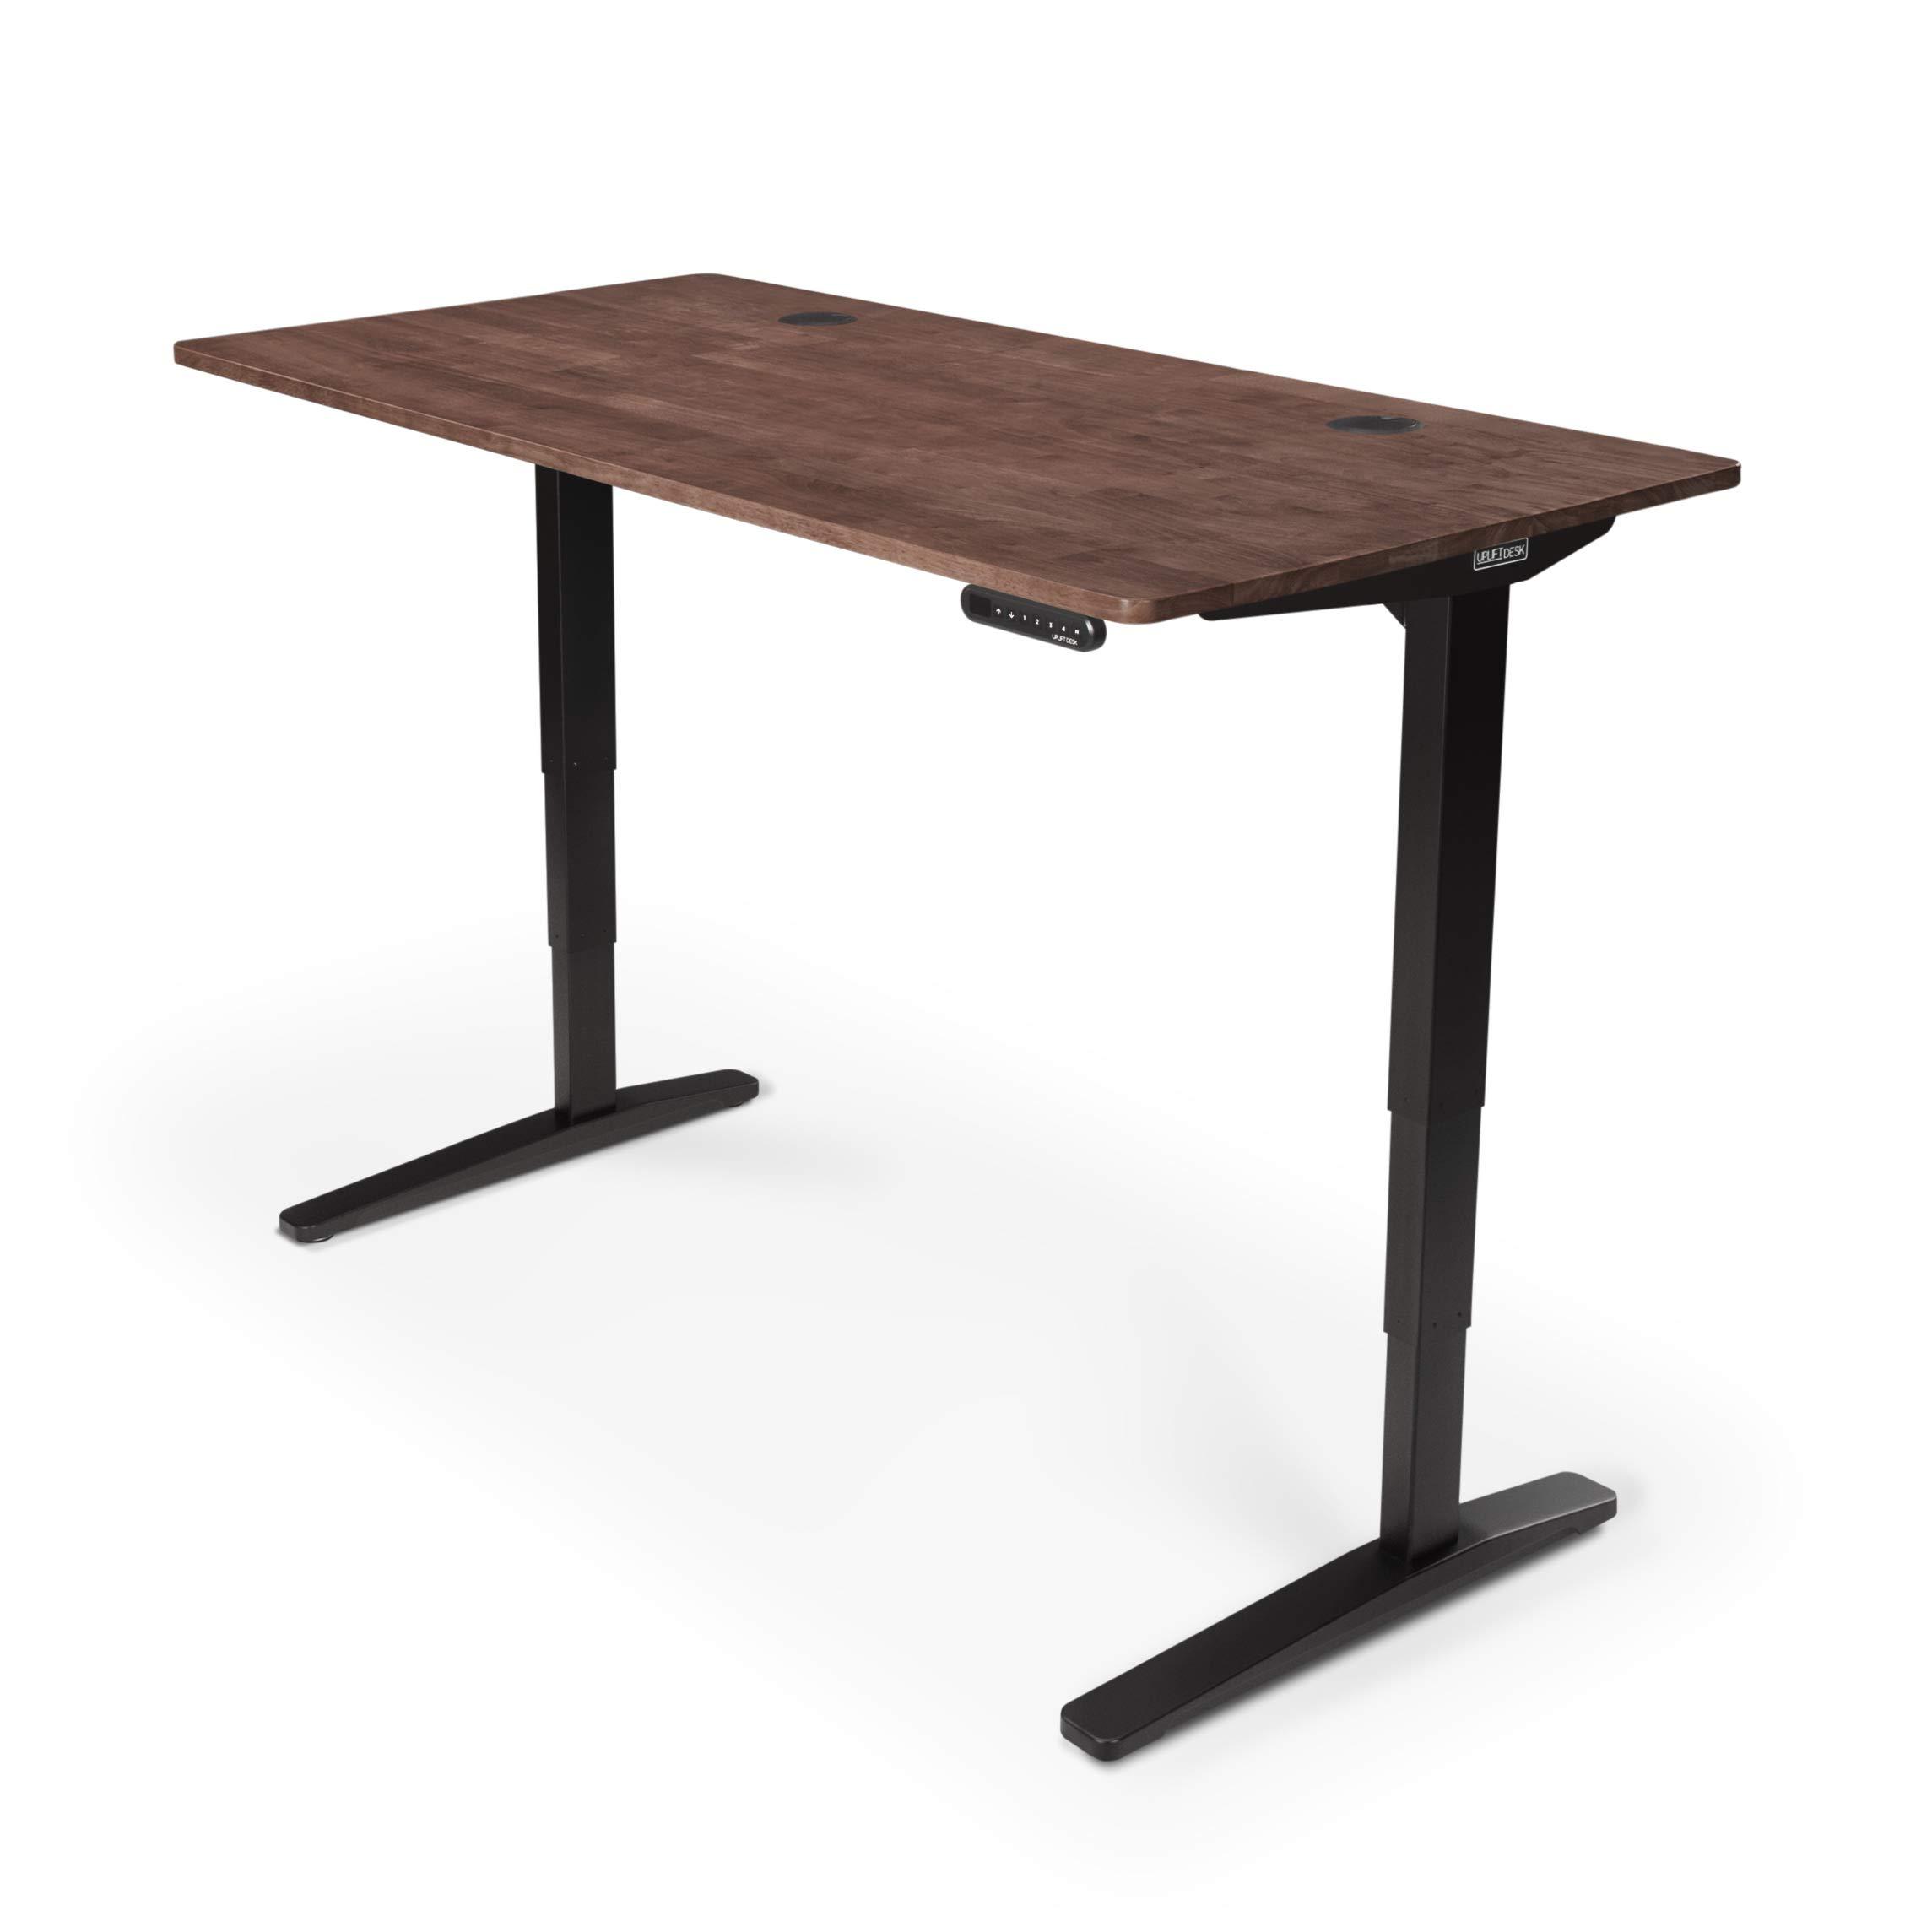 UPLIFT Desk - V2 Standing Desk with Dark Brown Rubberwood Solid Wood Desktop, Height Adjustable Frame (Black), Advanced Memory Keypad & Wire Grommets (Black), Bamboo Motion-X Board (72'' x 30'') by UPLIFT Desk